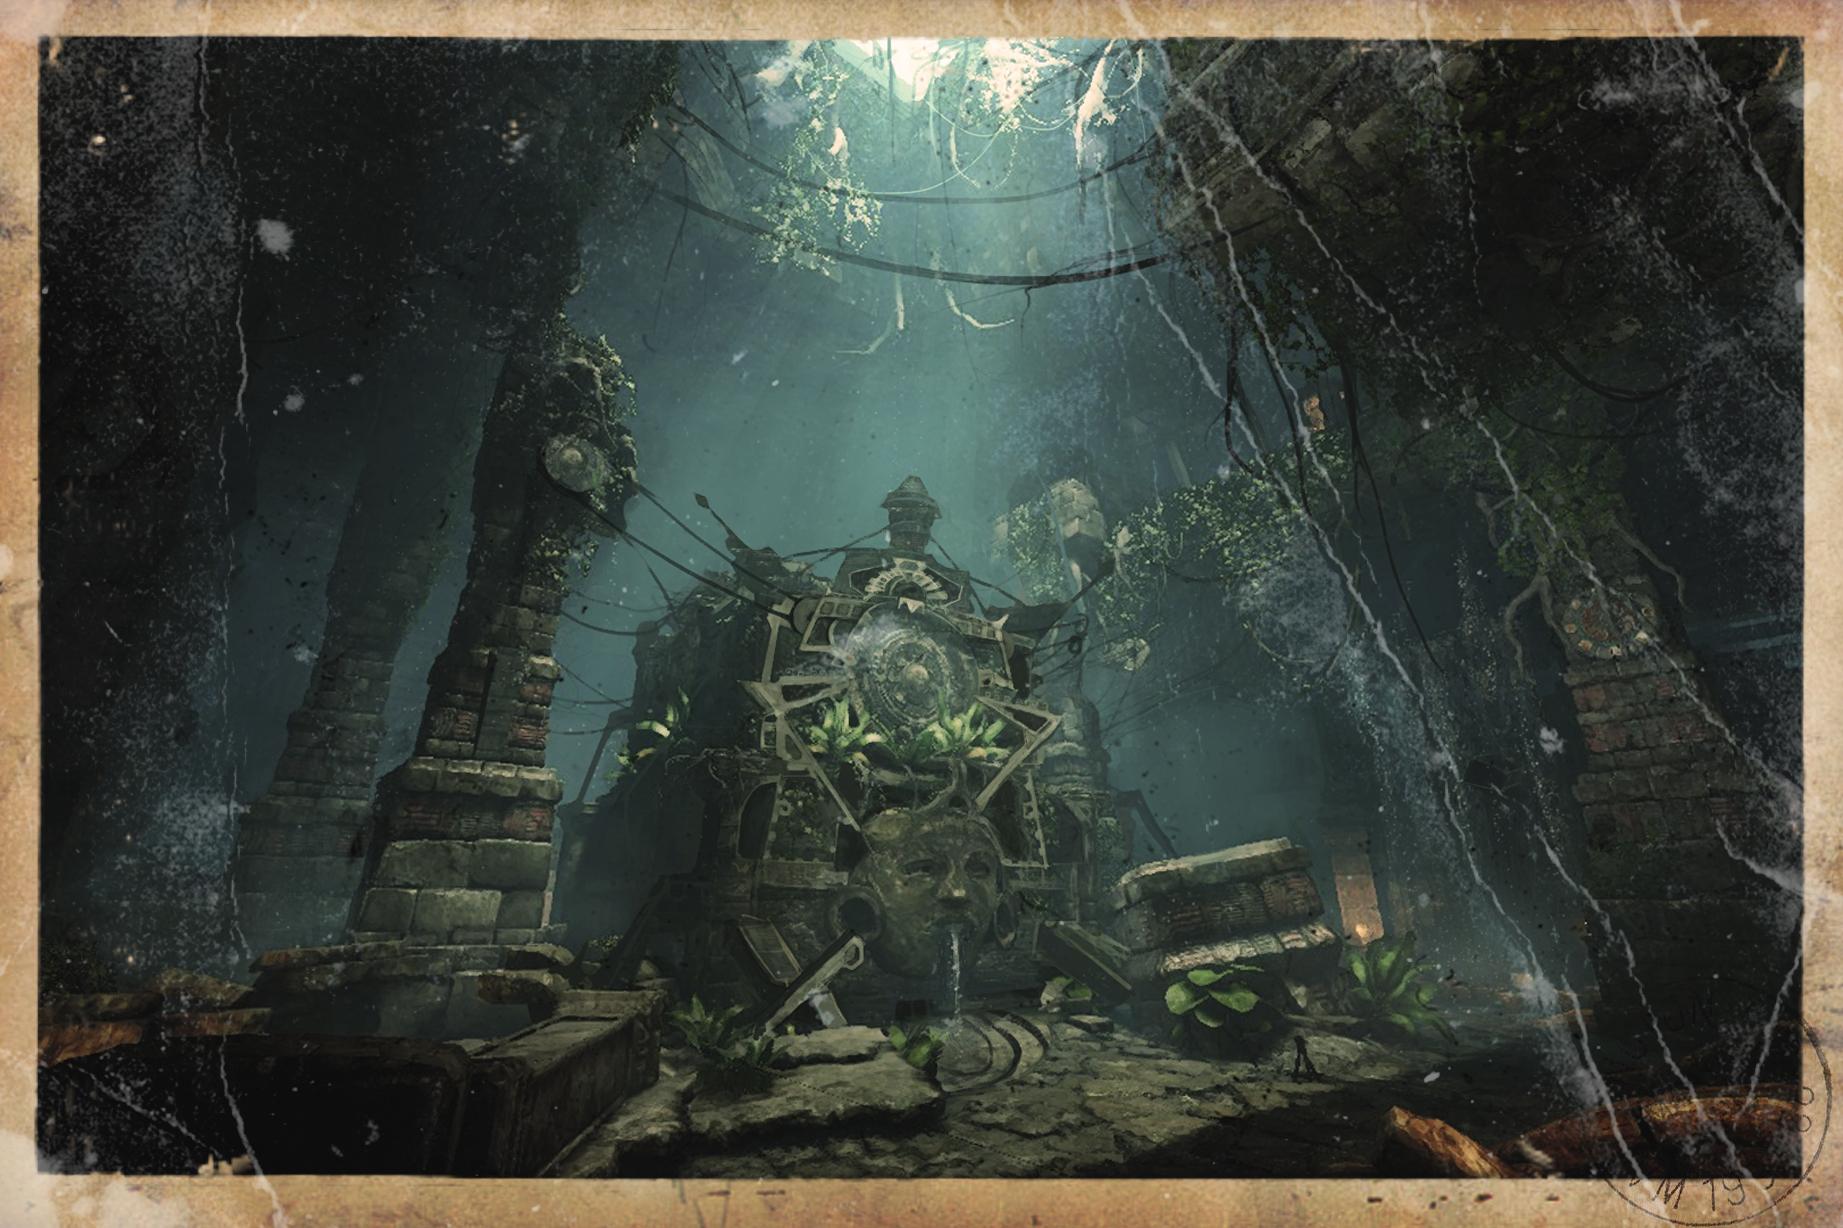 deadfall adventures background mayan - photo #3